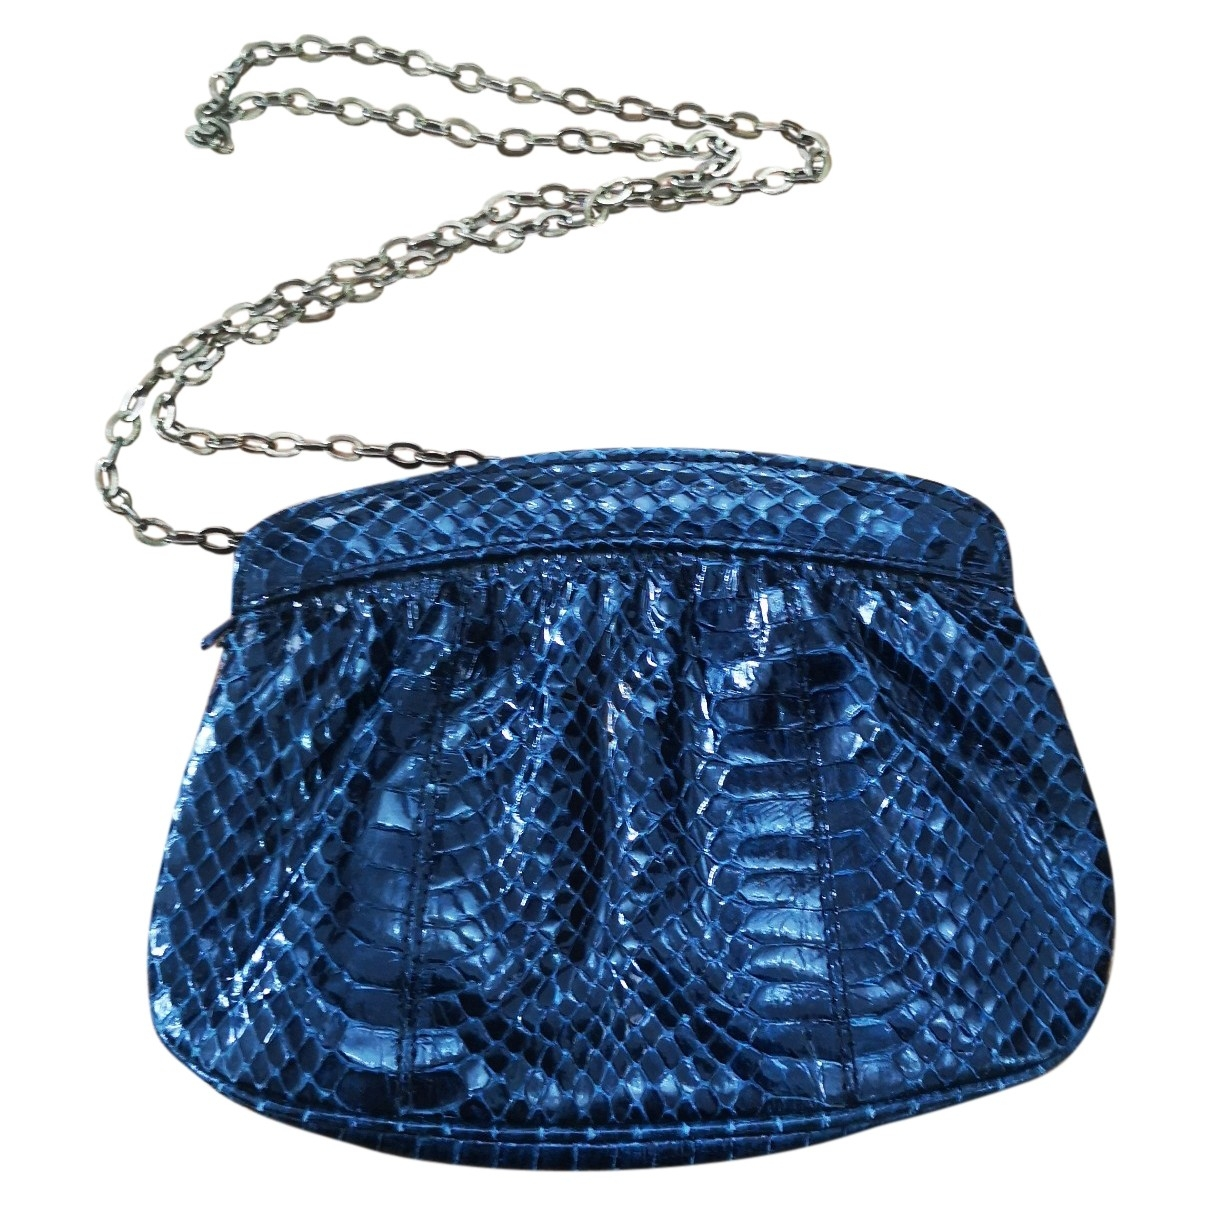 Bolsos clutch en Serpiente de agua Azul Non Signe / Unsigned